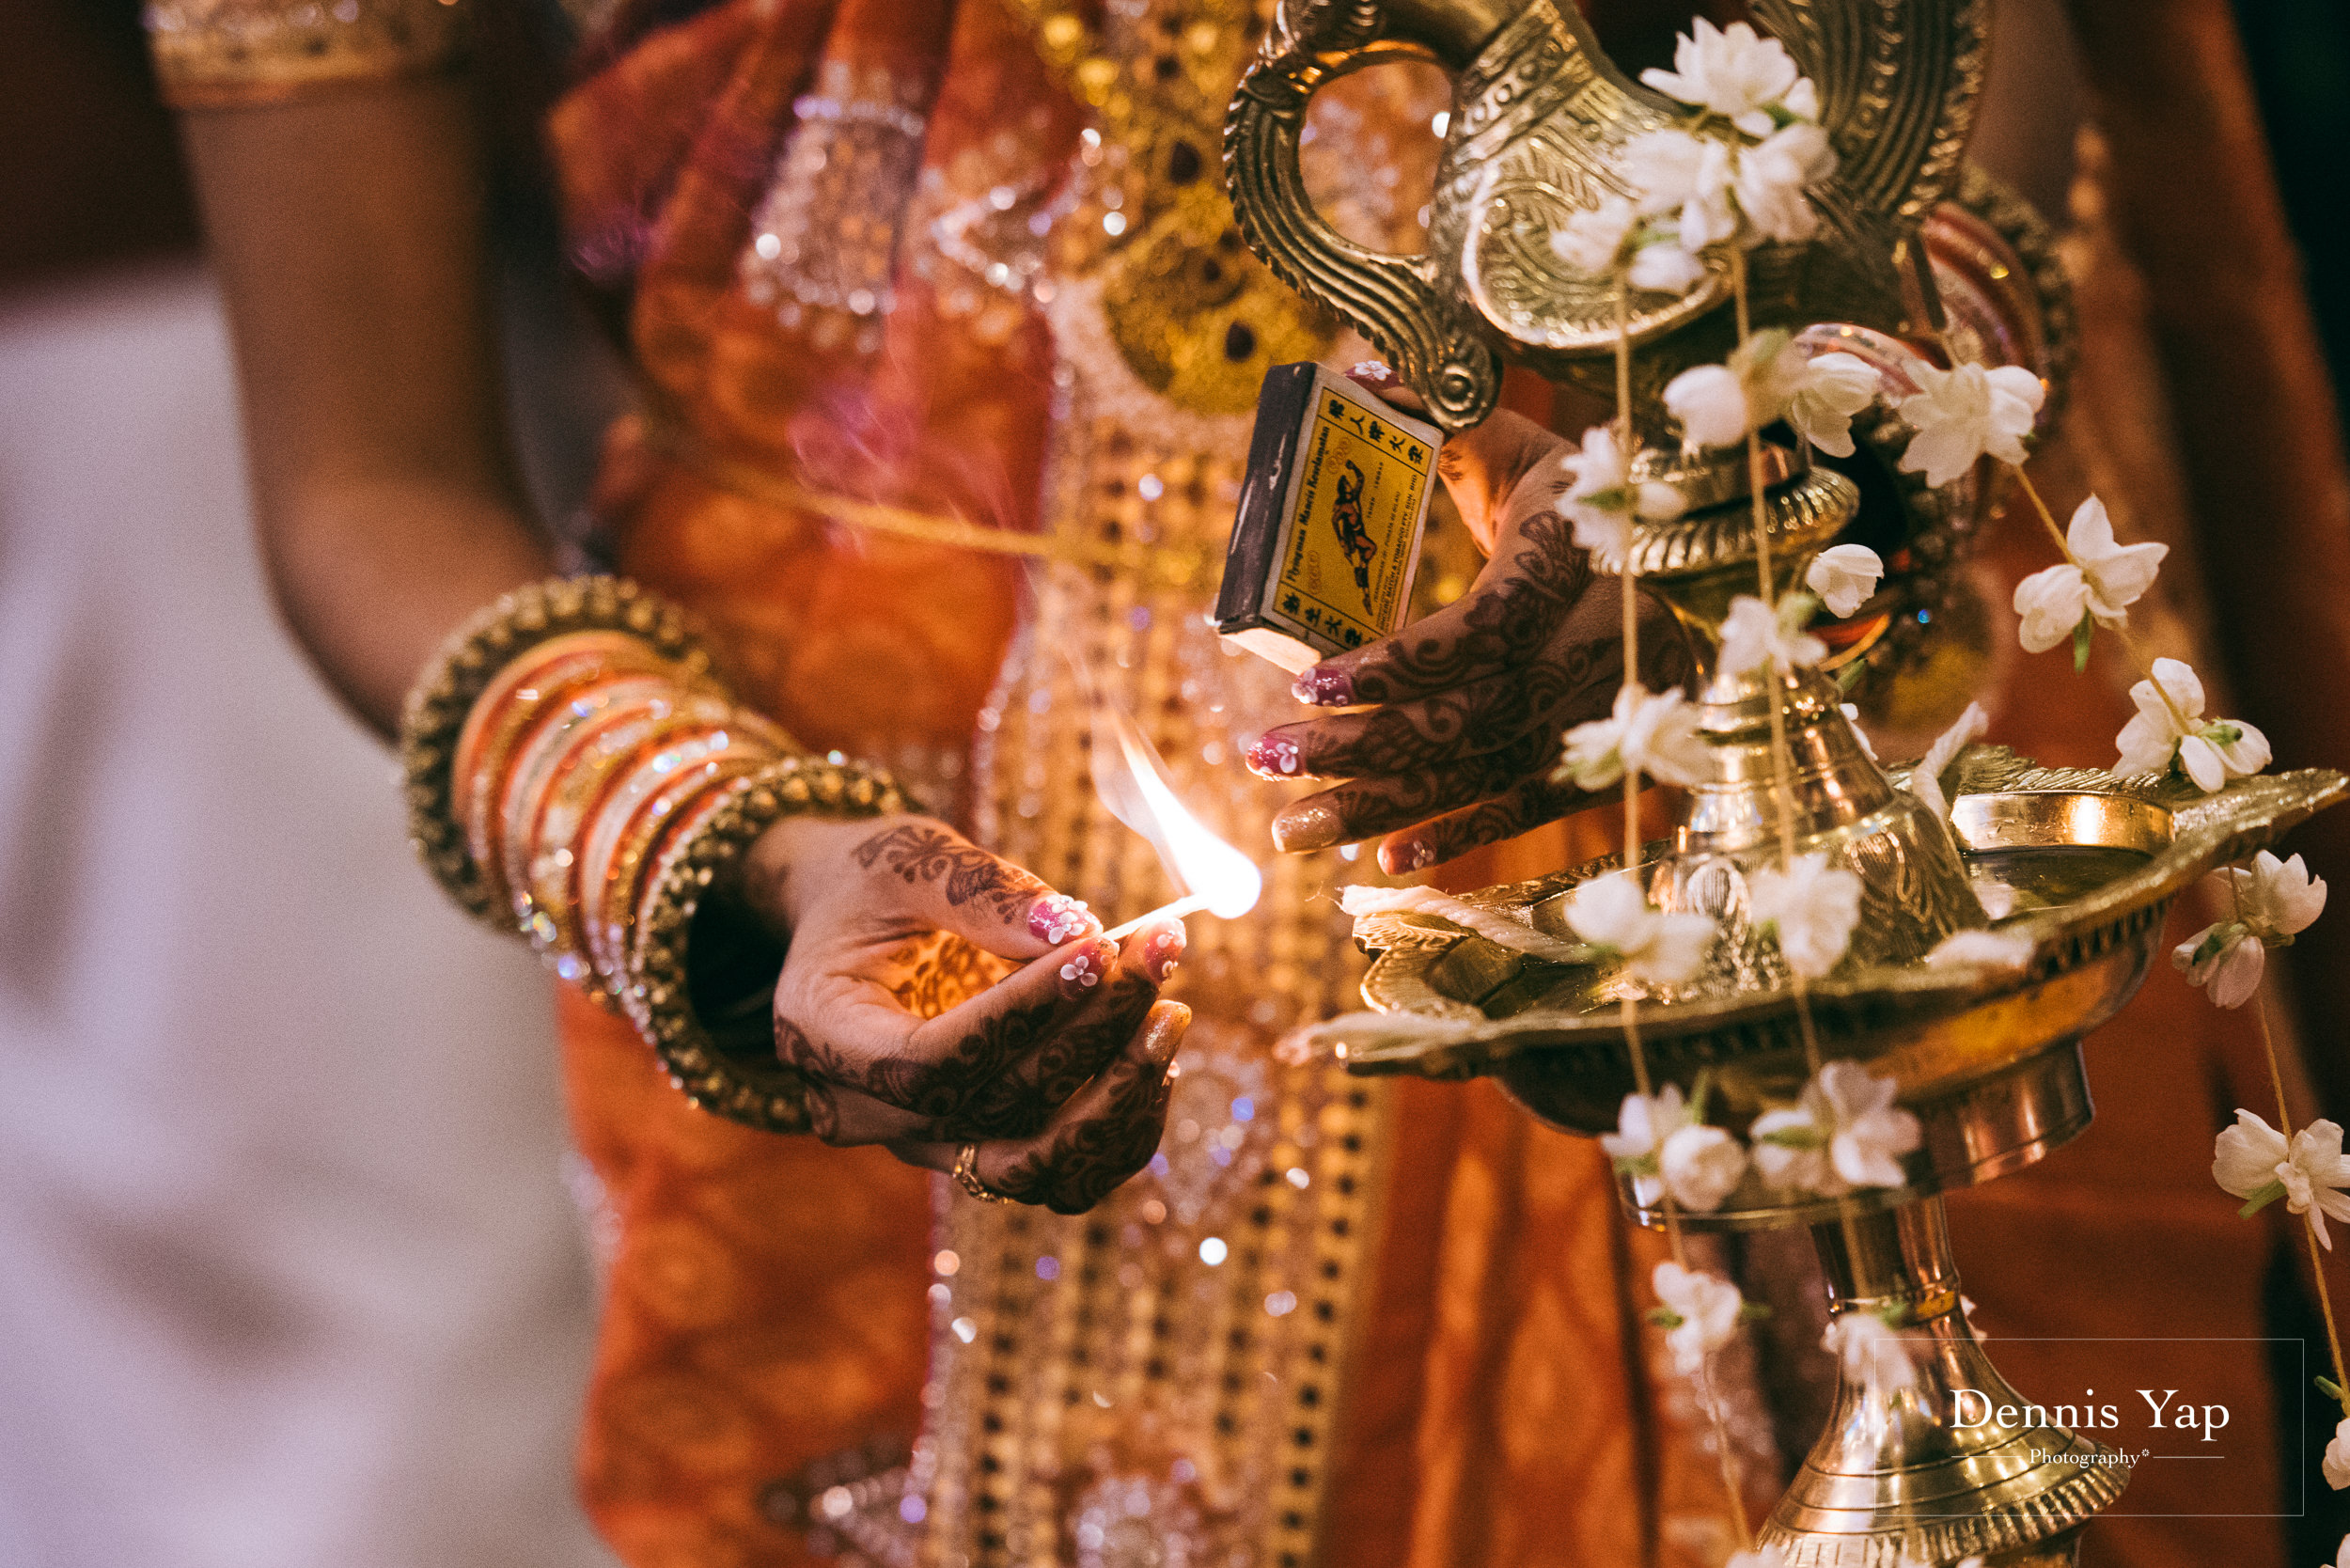 puvaneswaran cangitaa indian wedding ceremony ideal convention dennis yap photography malaysia-3.jpg